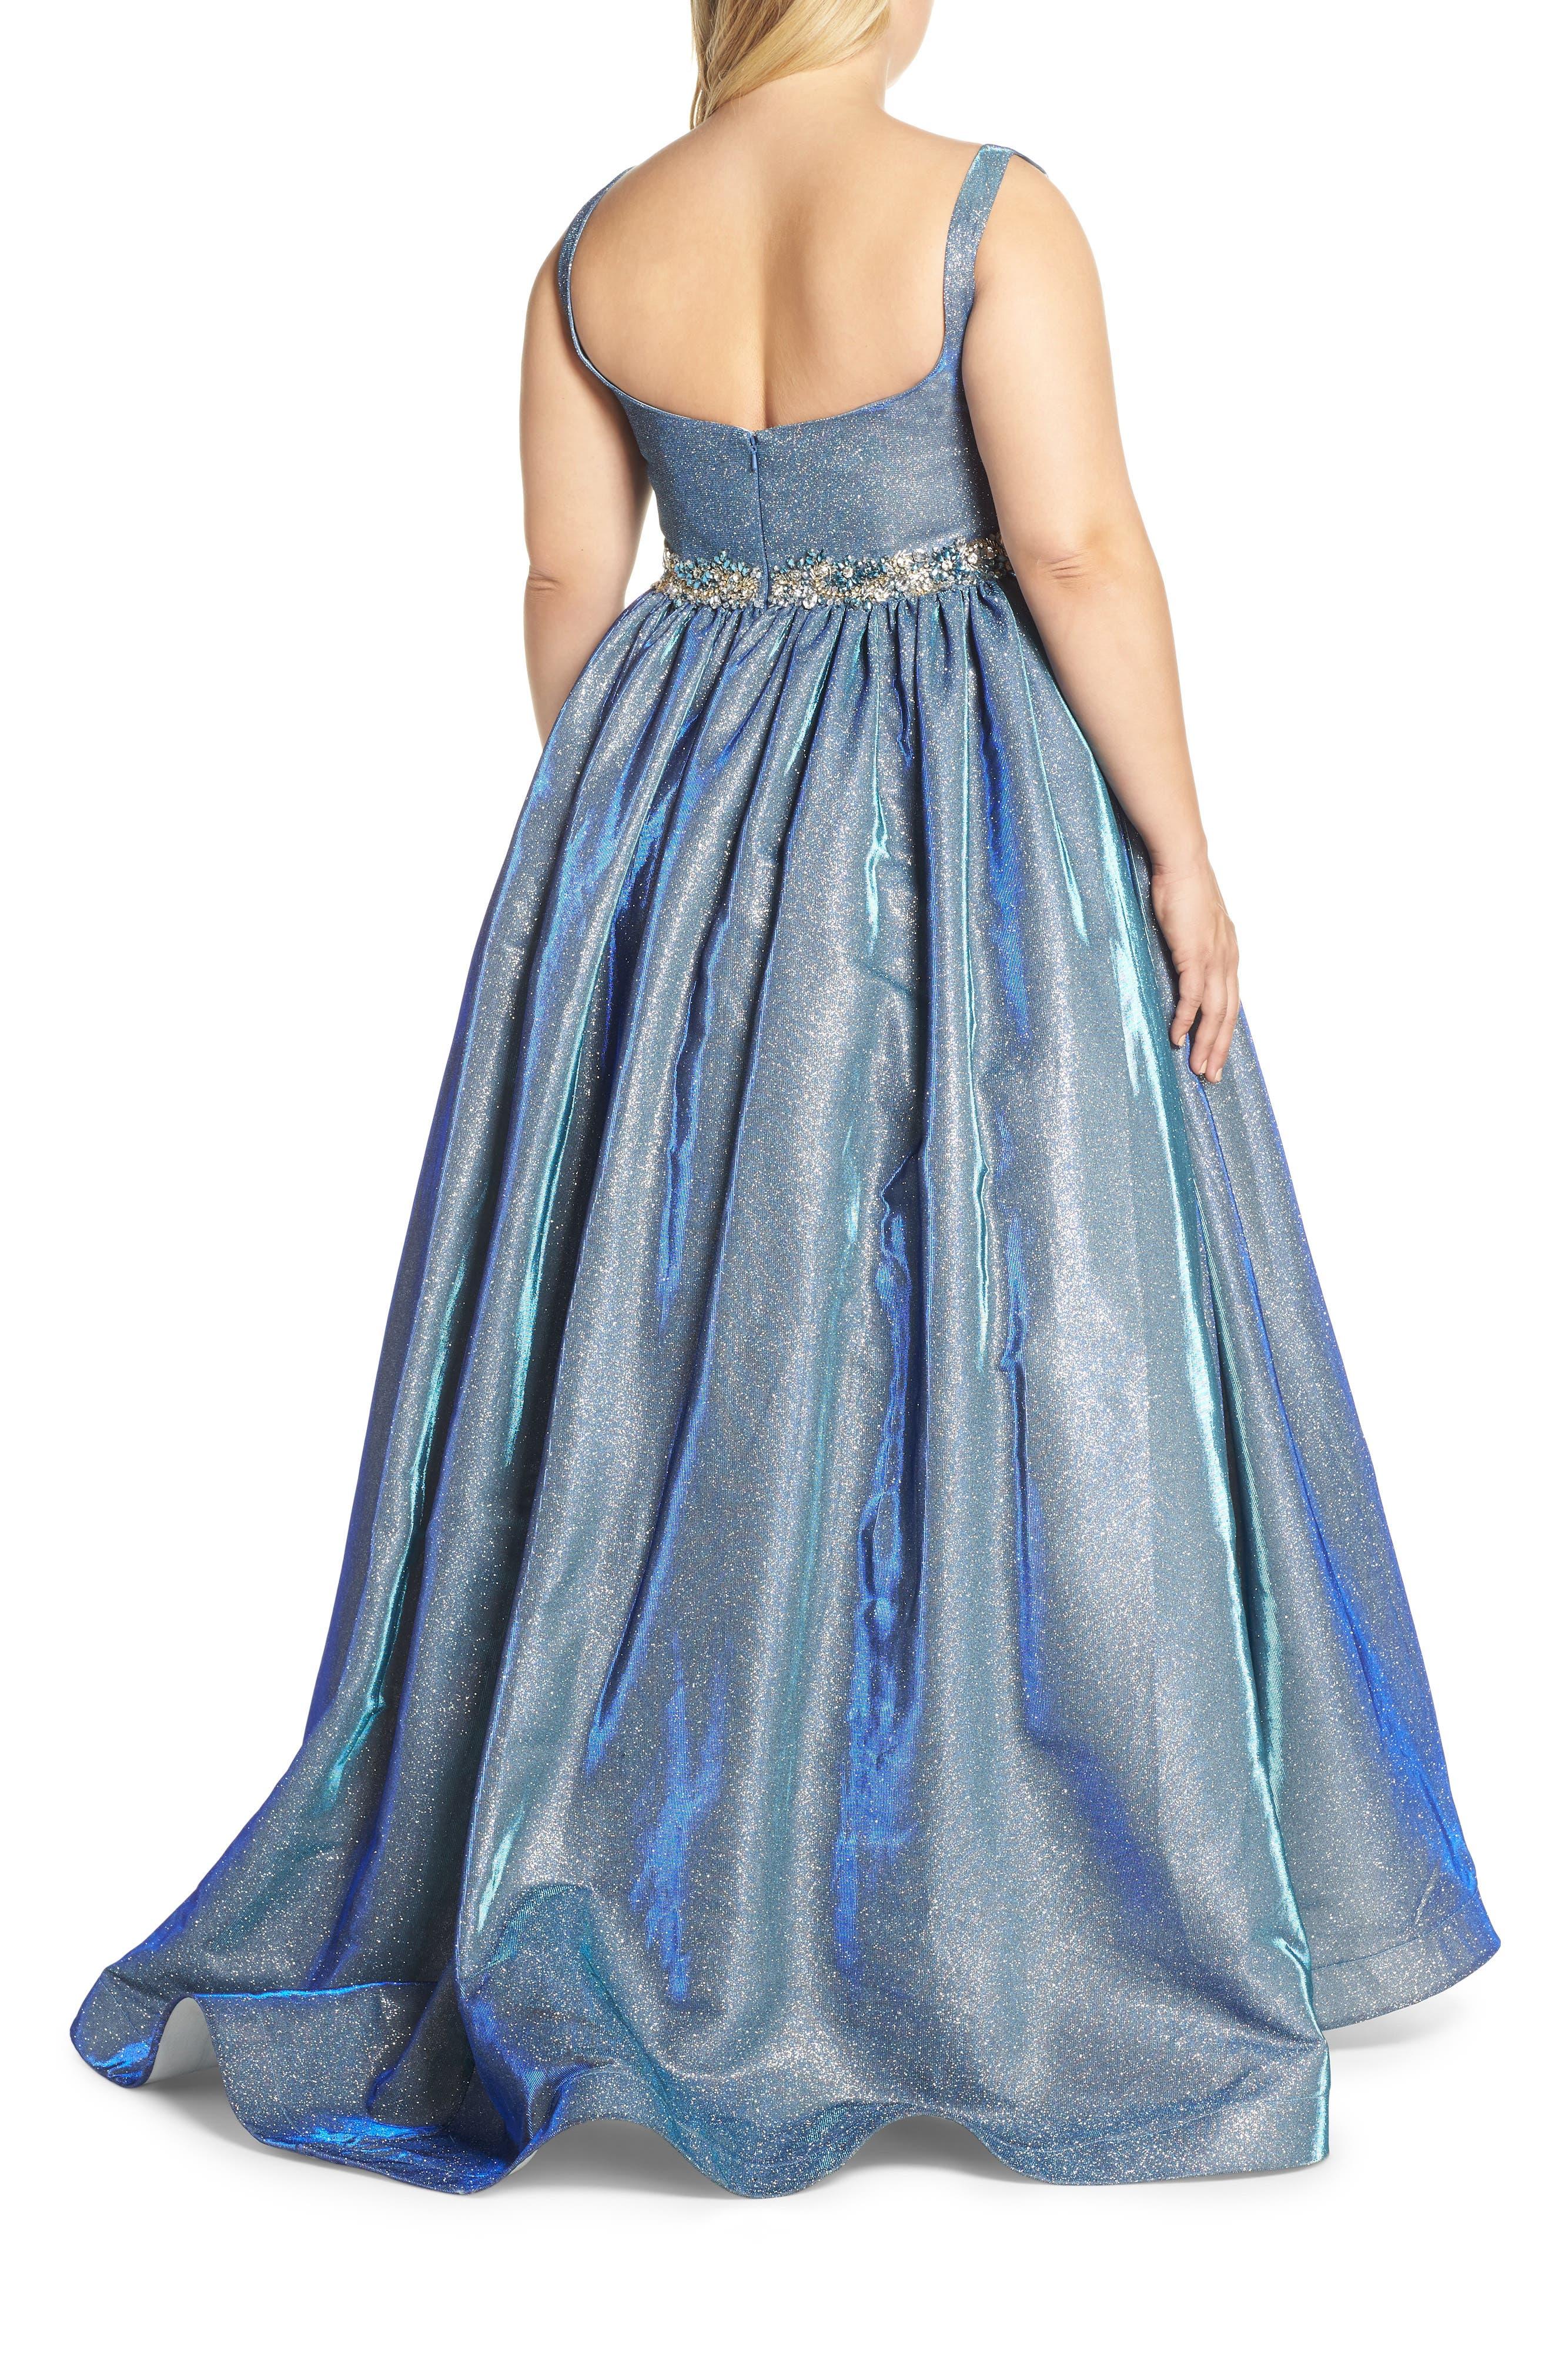 MAC DUGGAL, Jeweled Waist Metallic Evening Dress, Alternate thumbnail 2, color, BLUE